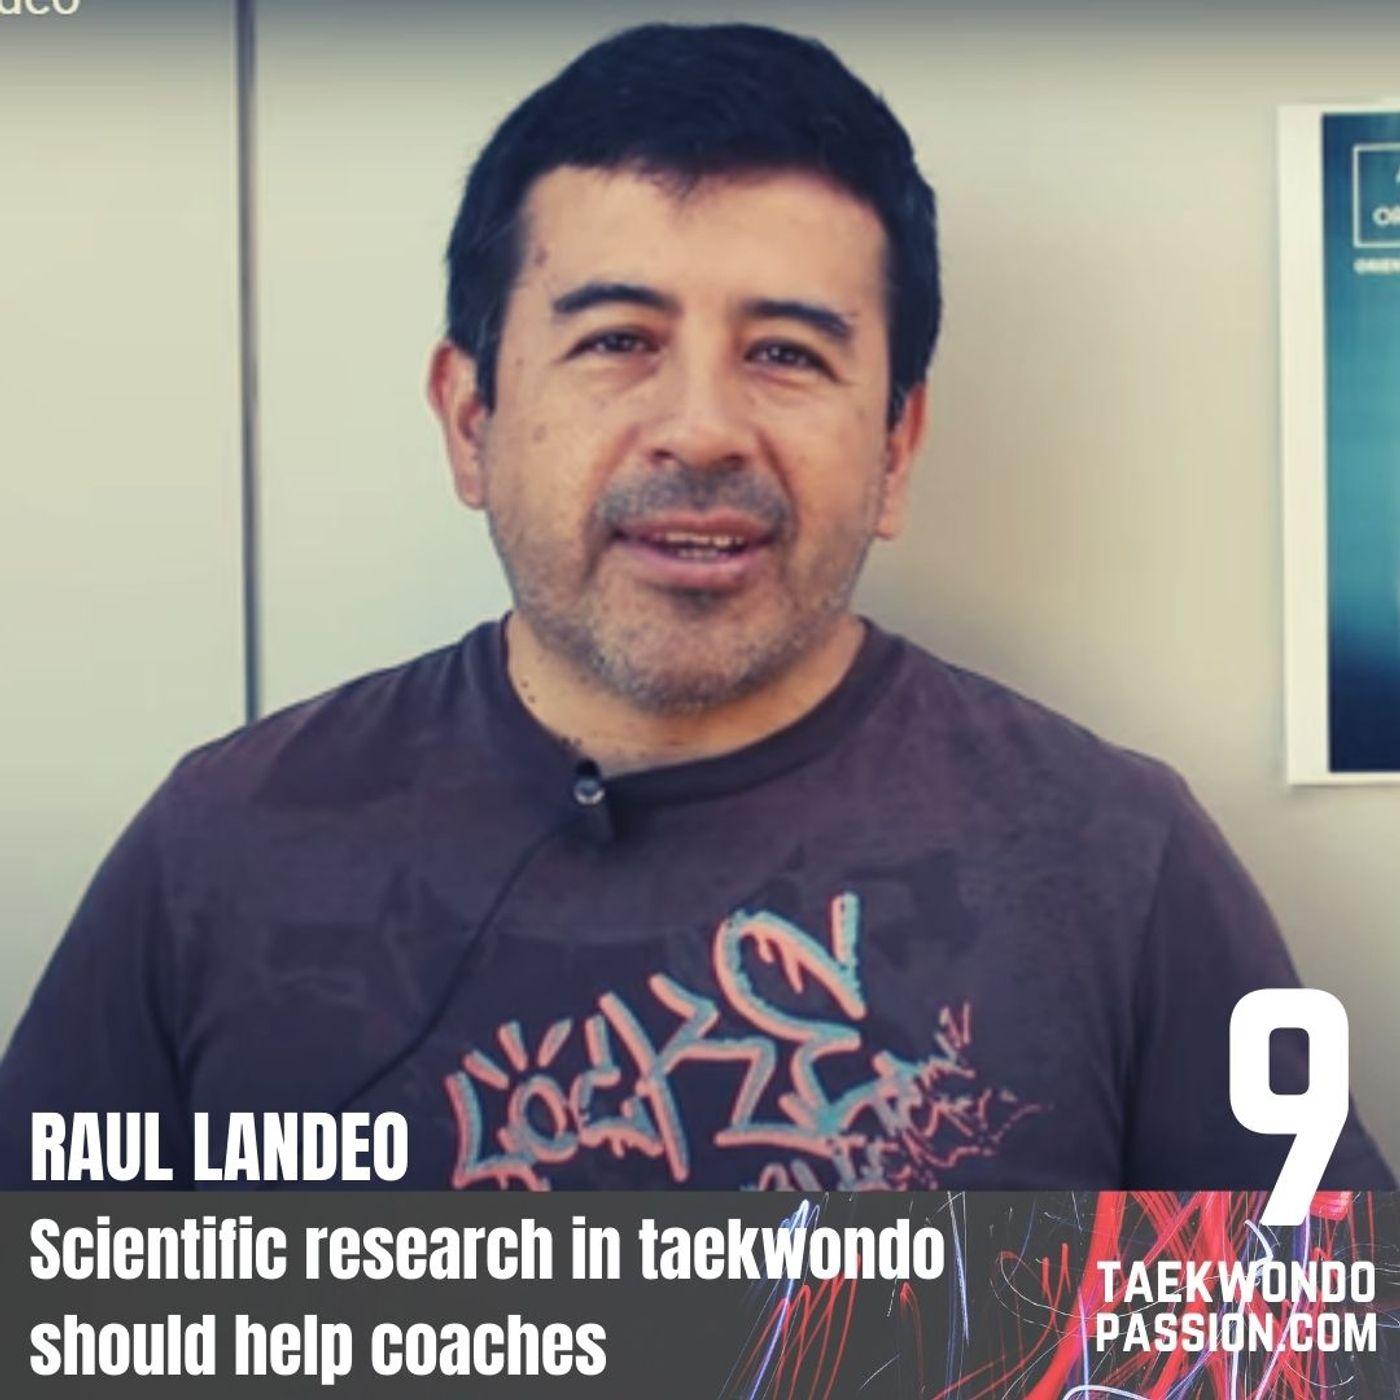 Raul Landeo - Scientific research in taekwondo should help coaches